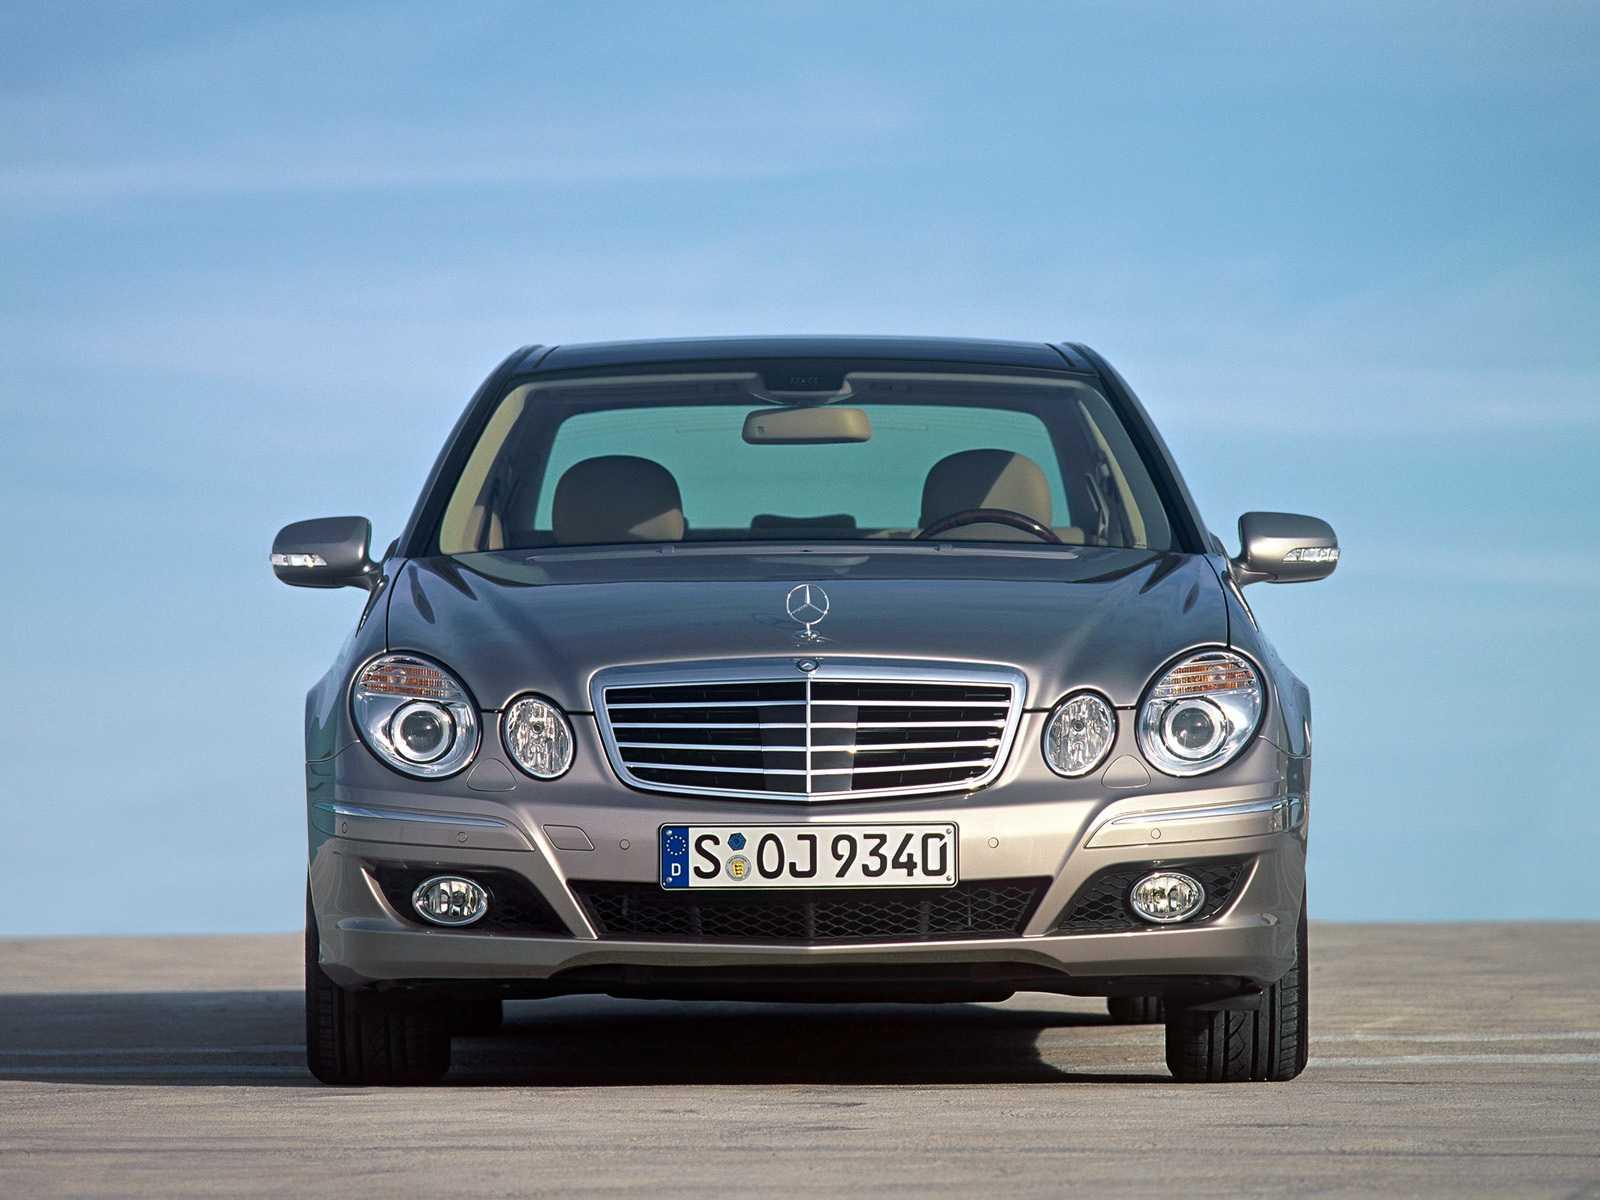 Увеличился расход топлива на Mercedes E-Class (W211) 2,2 л CDI в холодную погоду